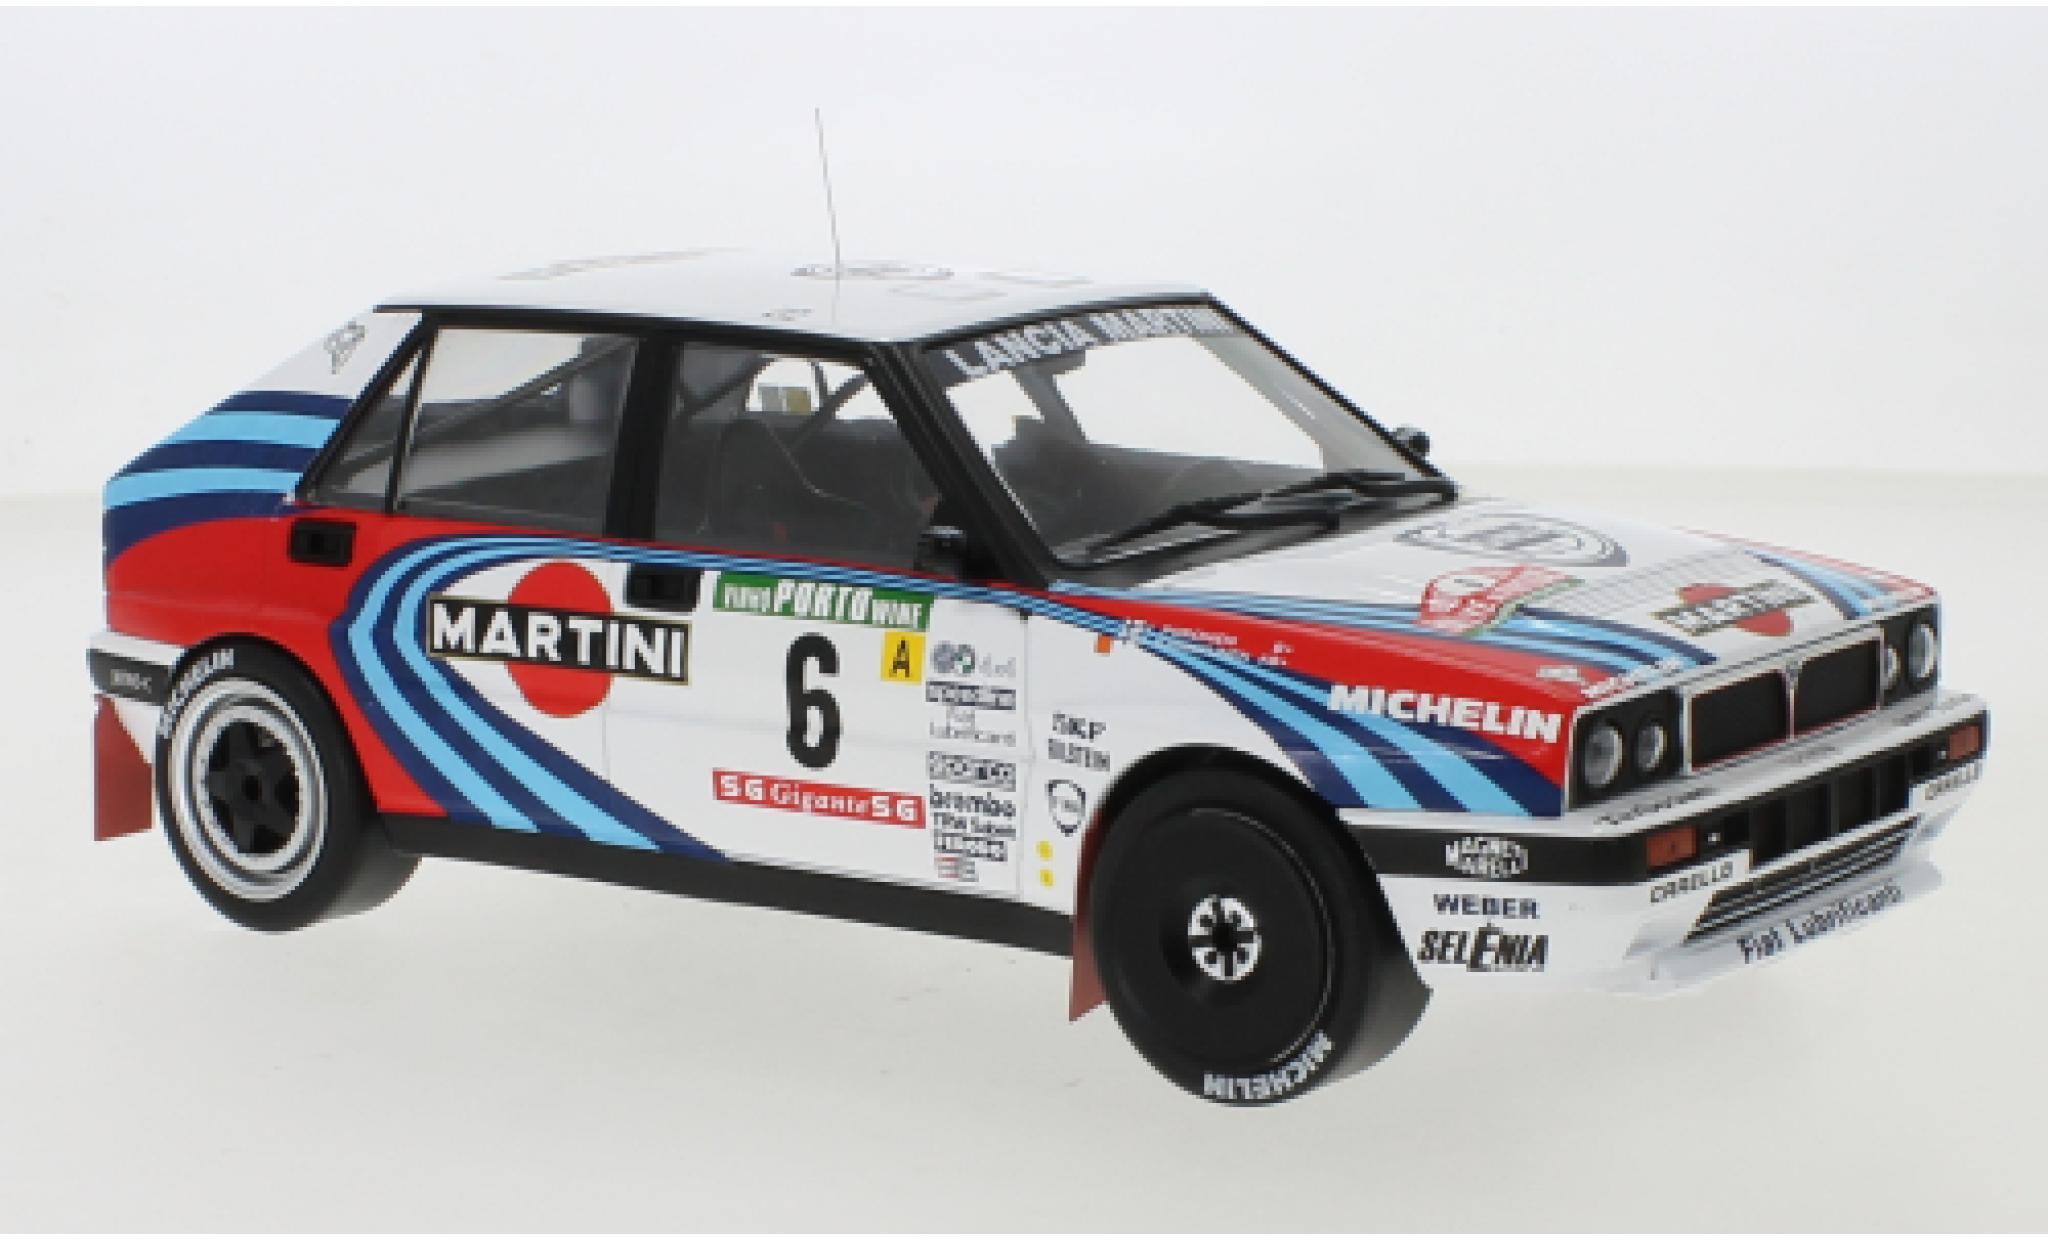 Lancia Delta 1/18 IXO Integrale 16V No.6 Martini Martini Rallye WM Rally Portugal 1990 J.Kankkunen/J.Piironen